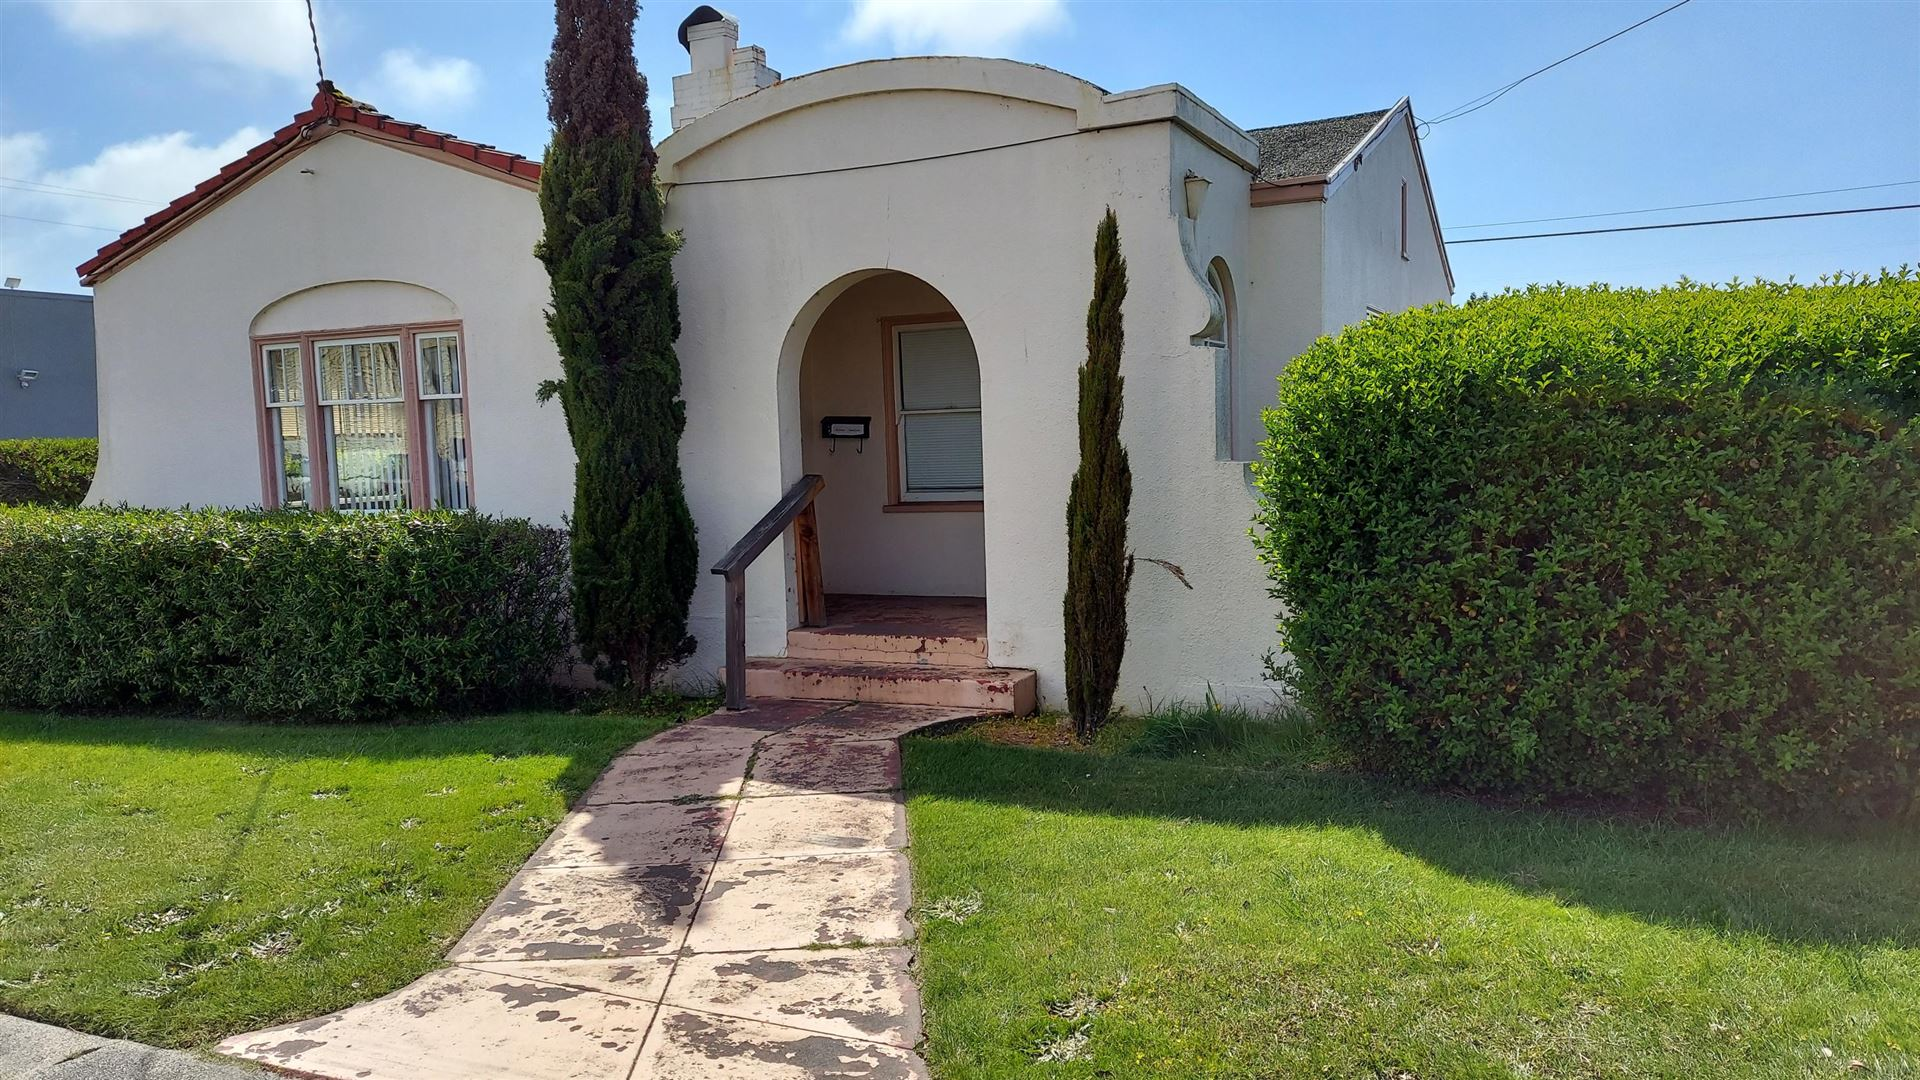 3004 H Street, Eureka, CA 95501 - MLS#: 258951